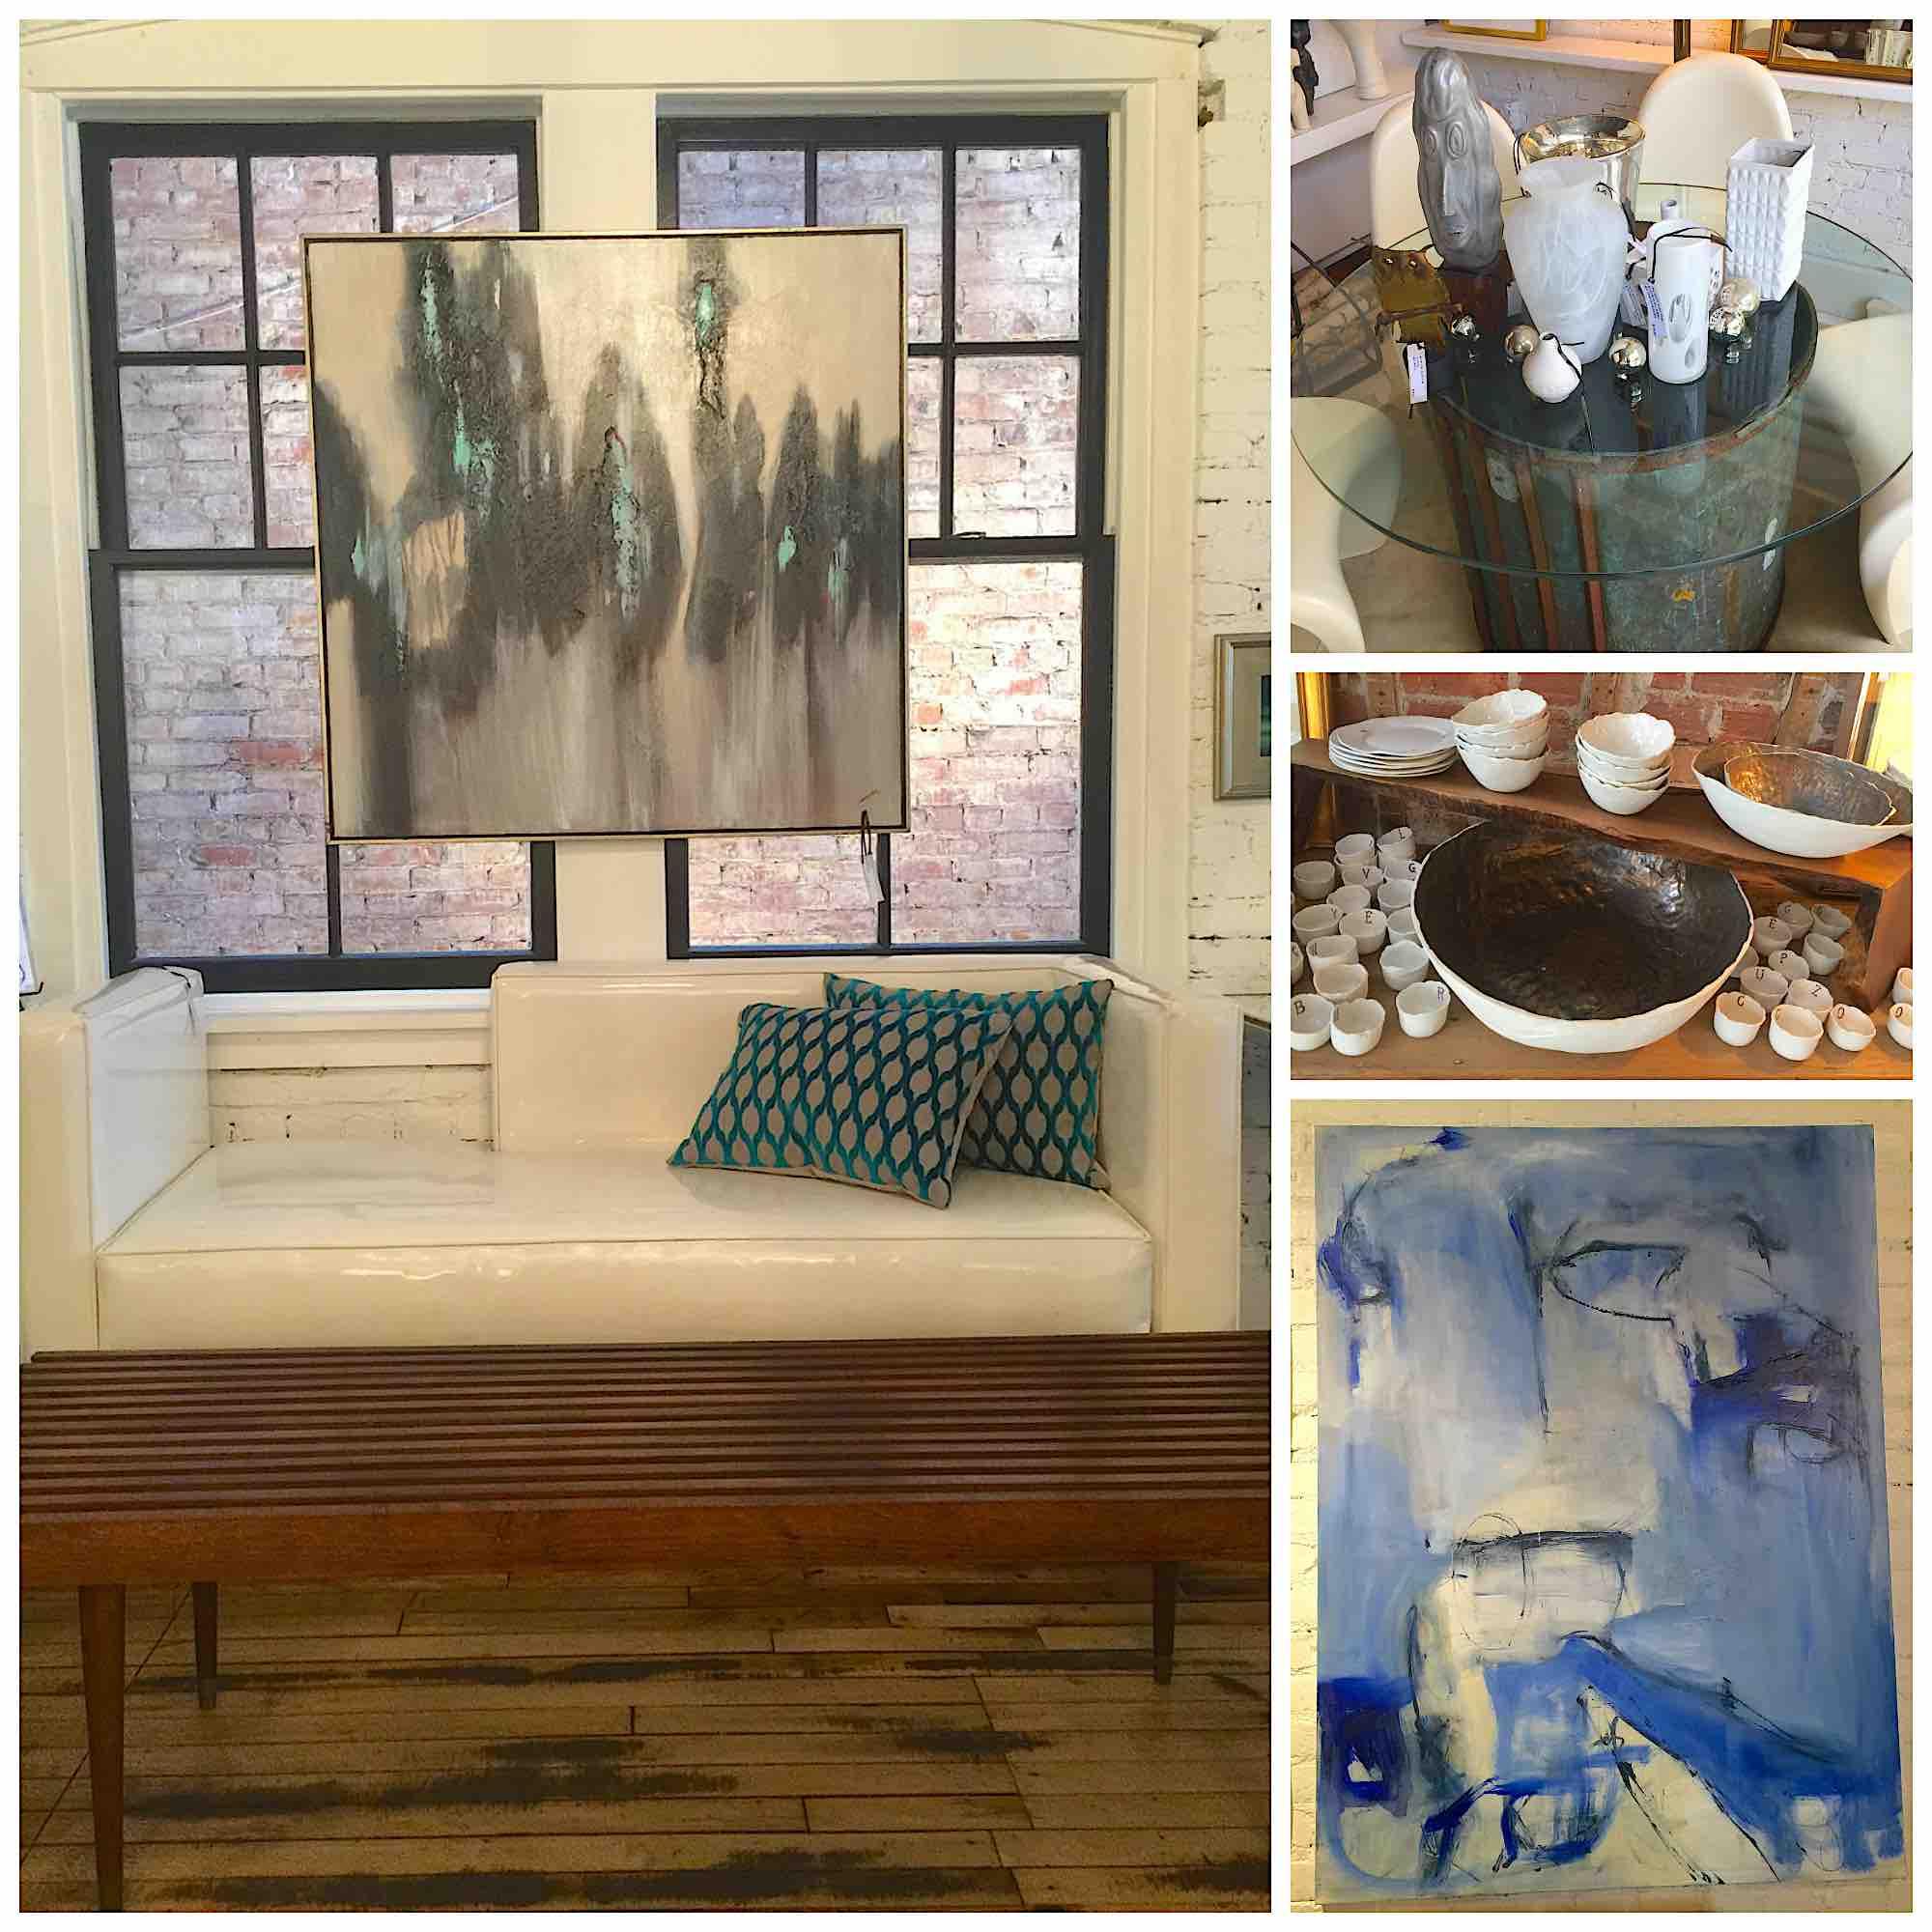 Holiday Gift Ideas - Hawthorne | Summit, NJ